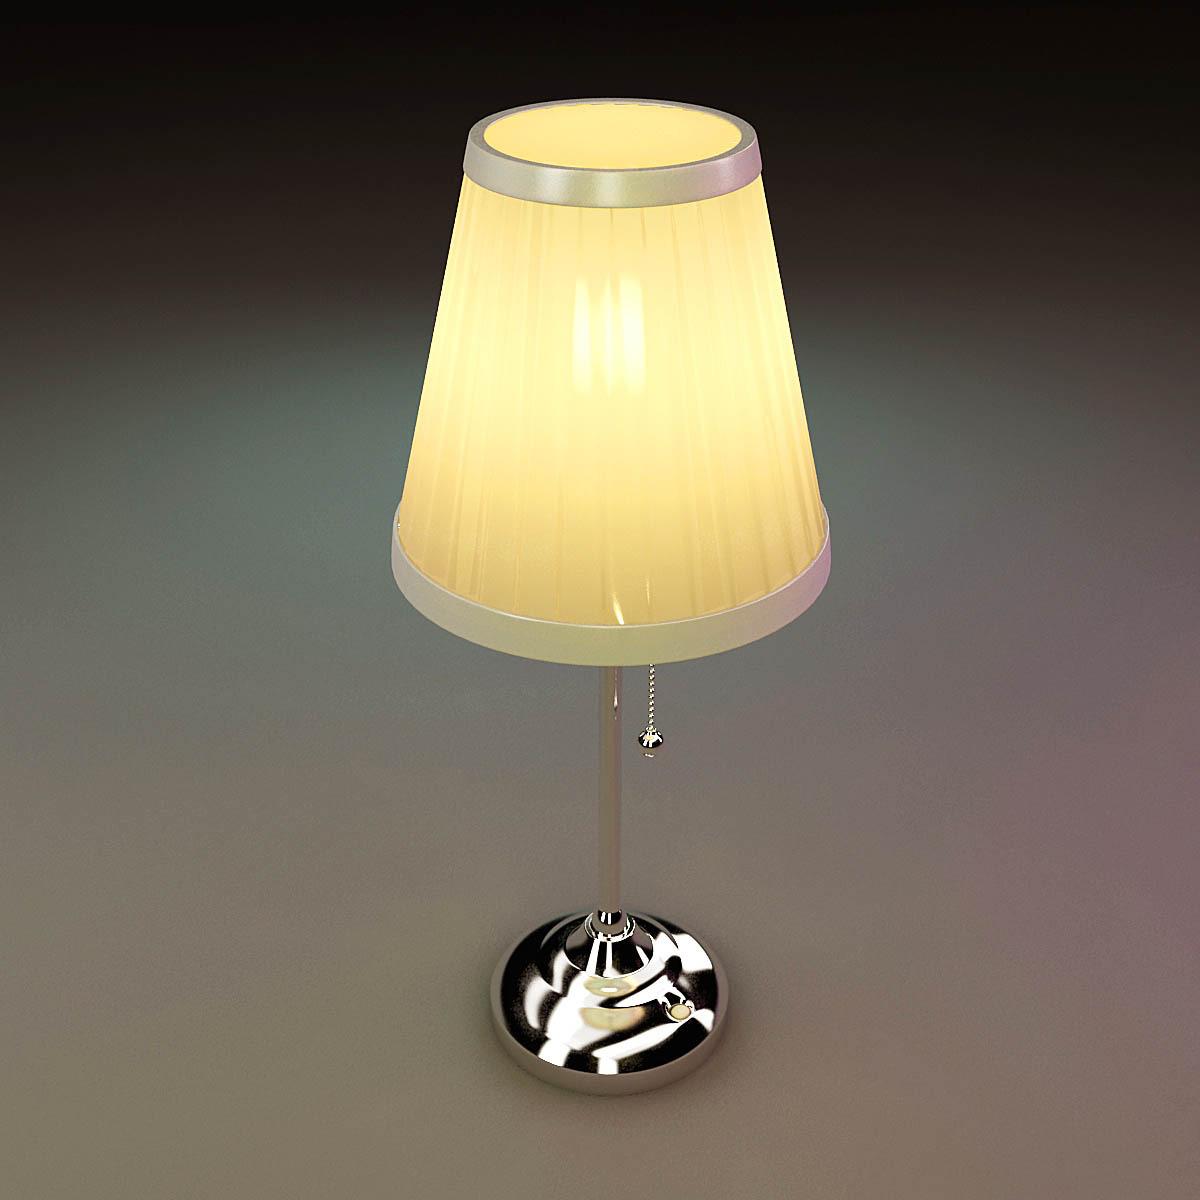 Ikea table lamps 10 in 1 by sercancetin 3docean 2g kajutag klabb 2g klabbg lampan 2g lampang naturel 2g naturelg stockholm 2g stockholmg vate 2g vateg geotapseo Image collections